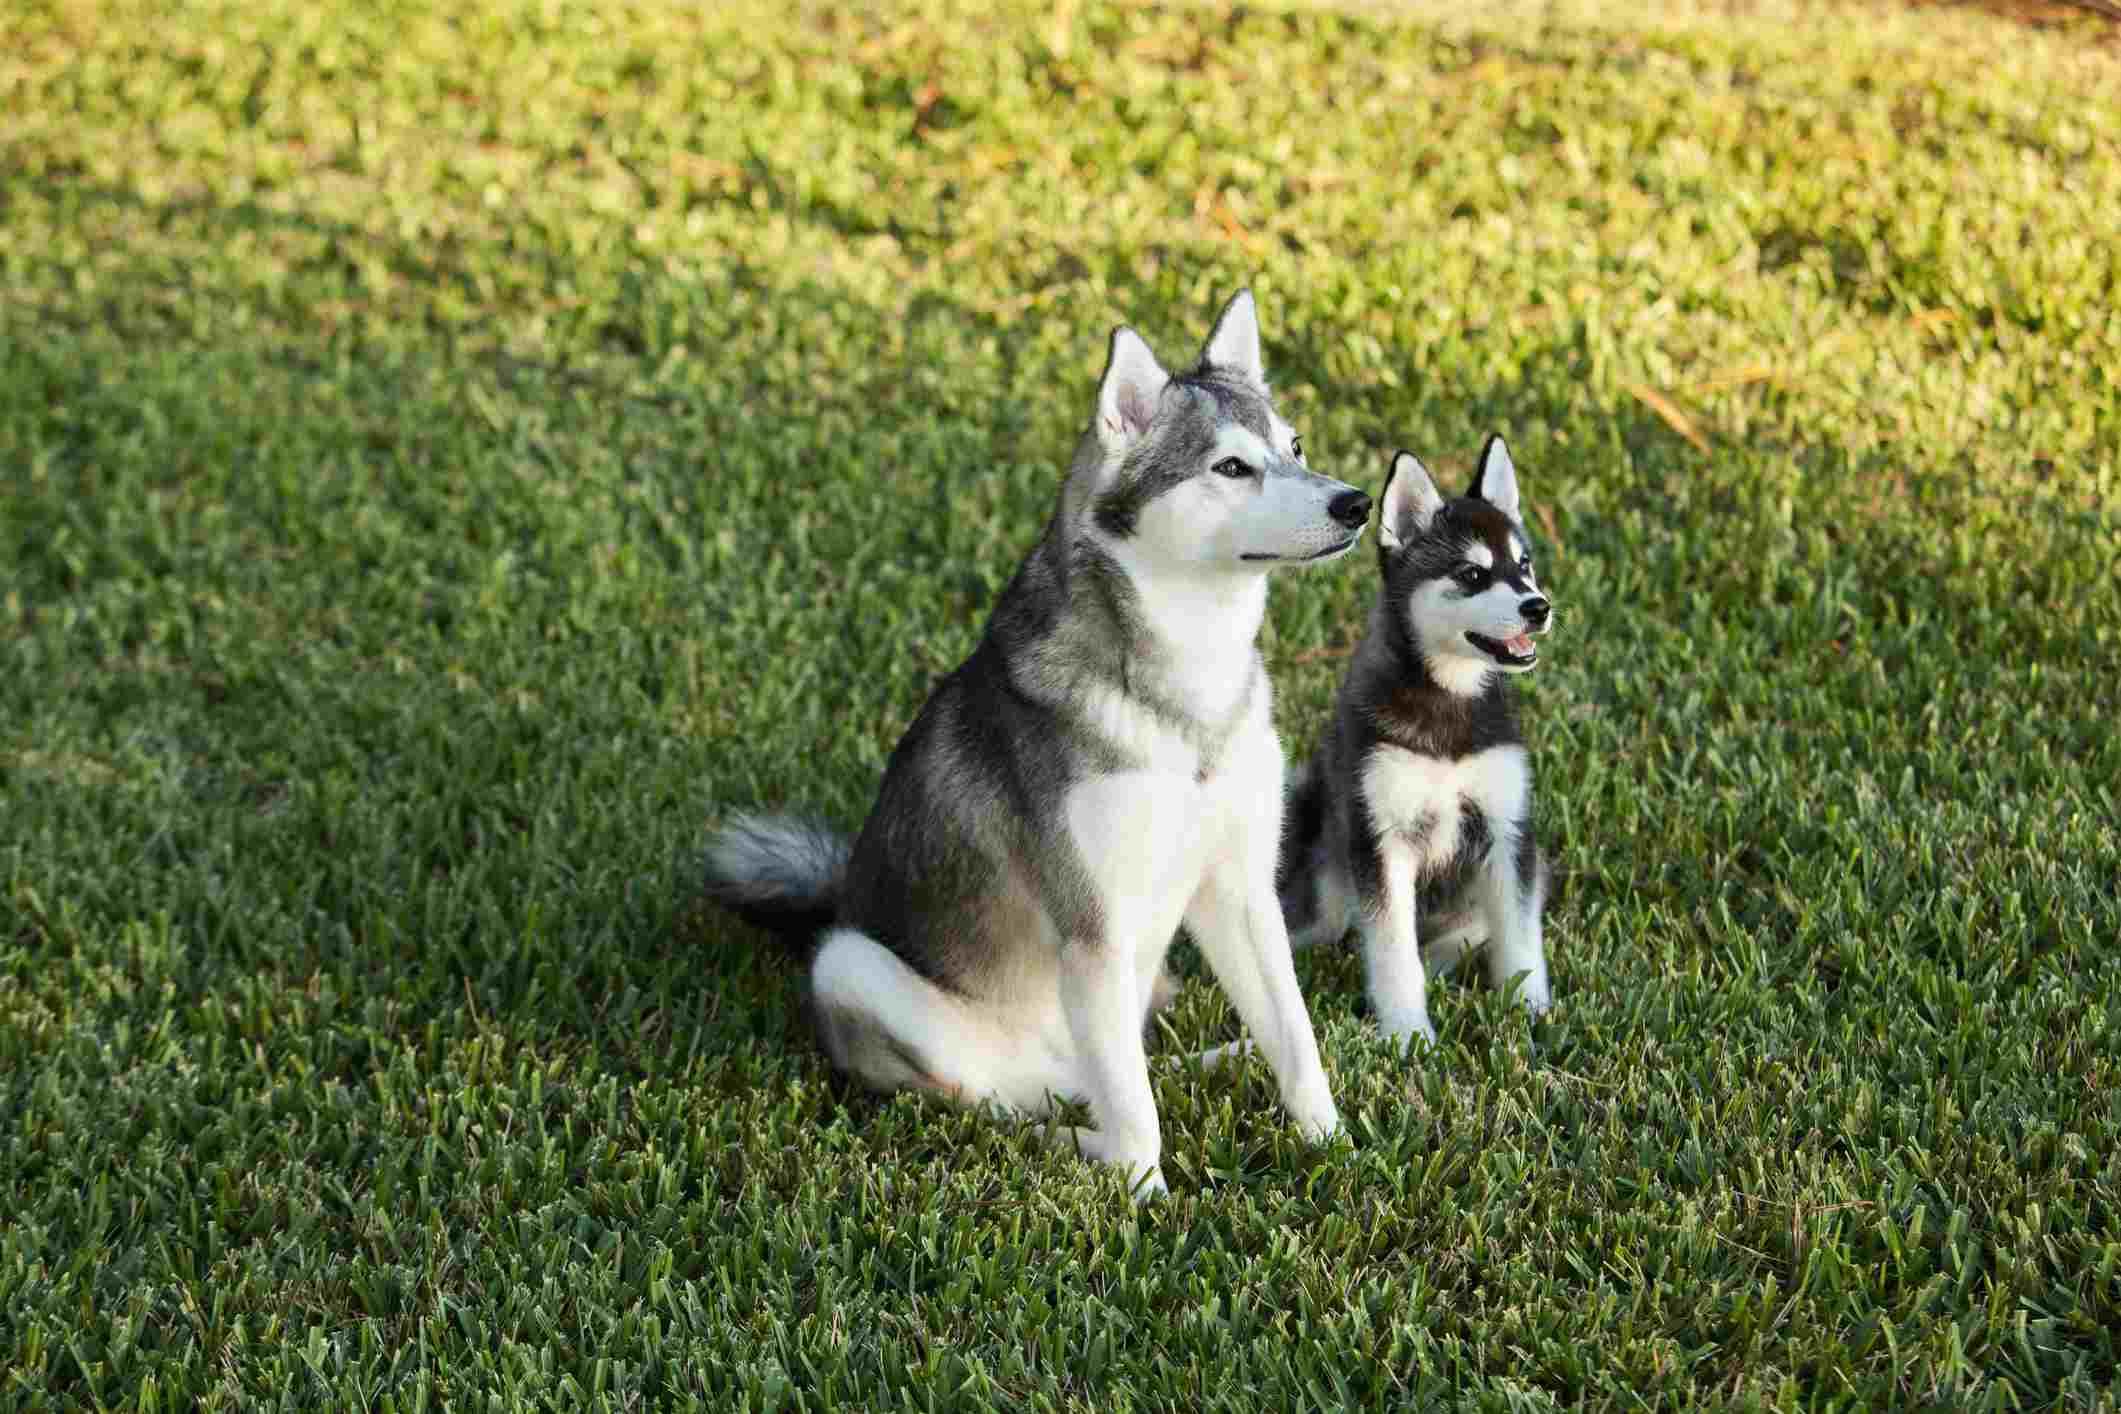 Alaskan Klee Kai dog and puppy